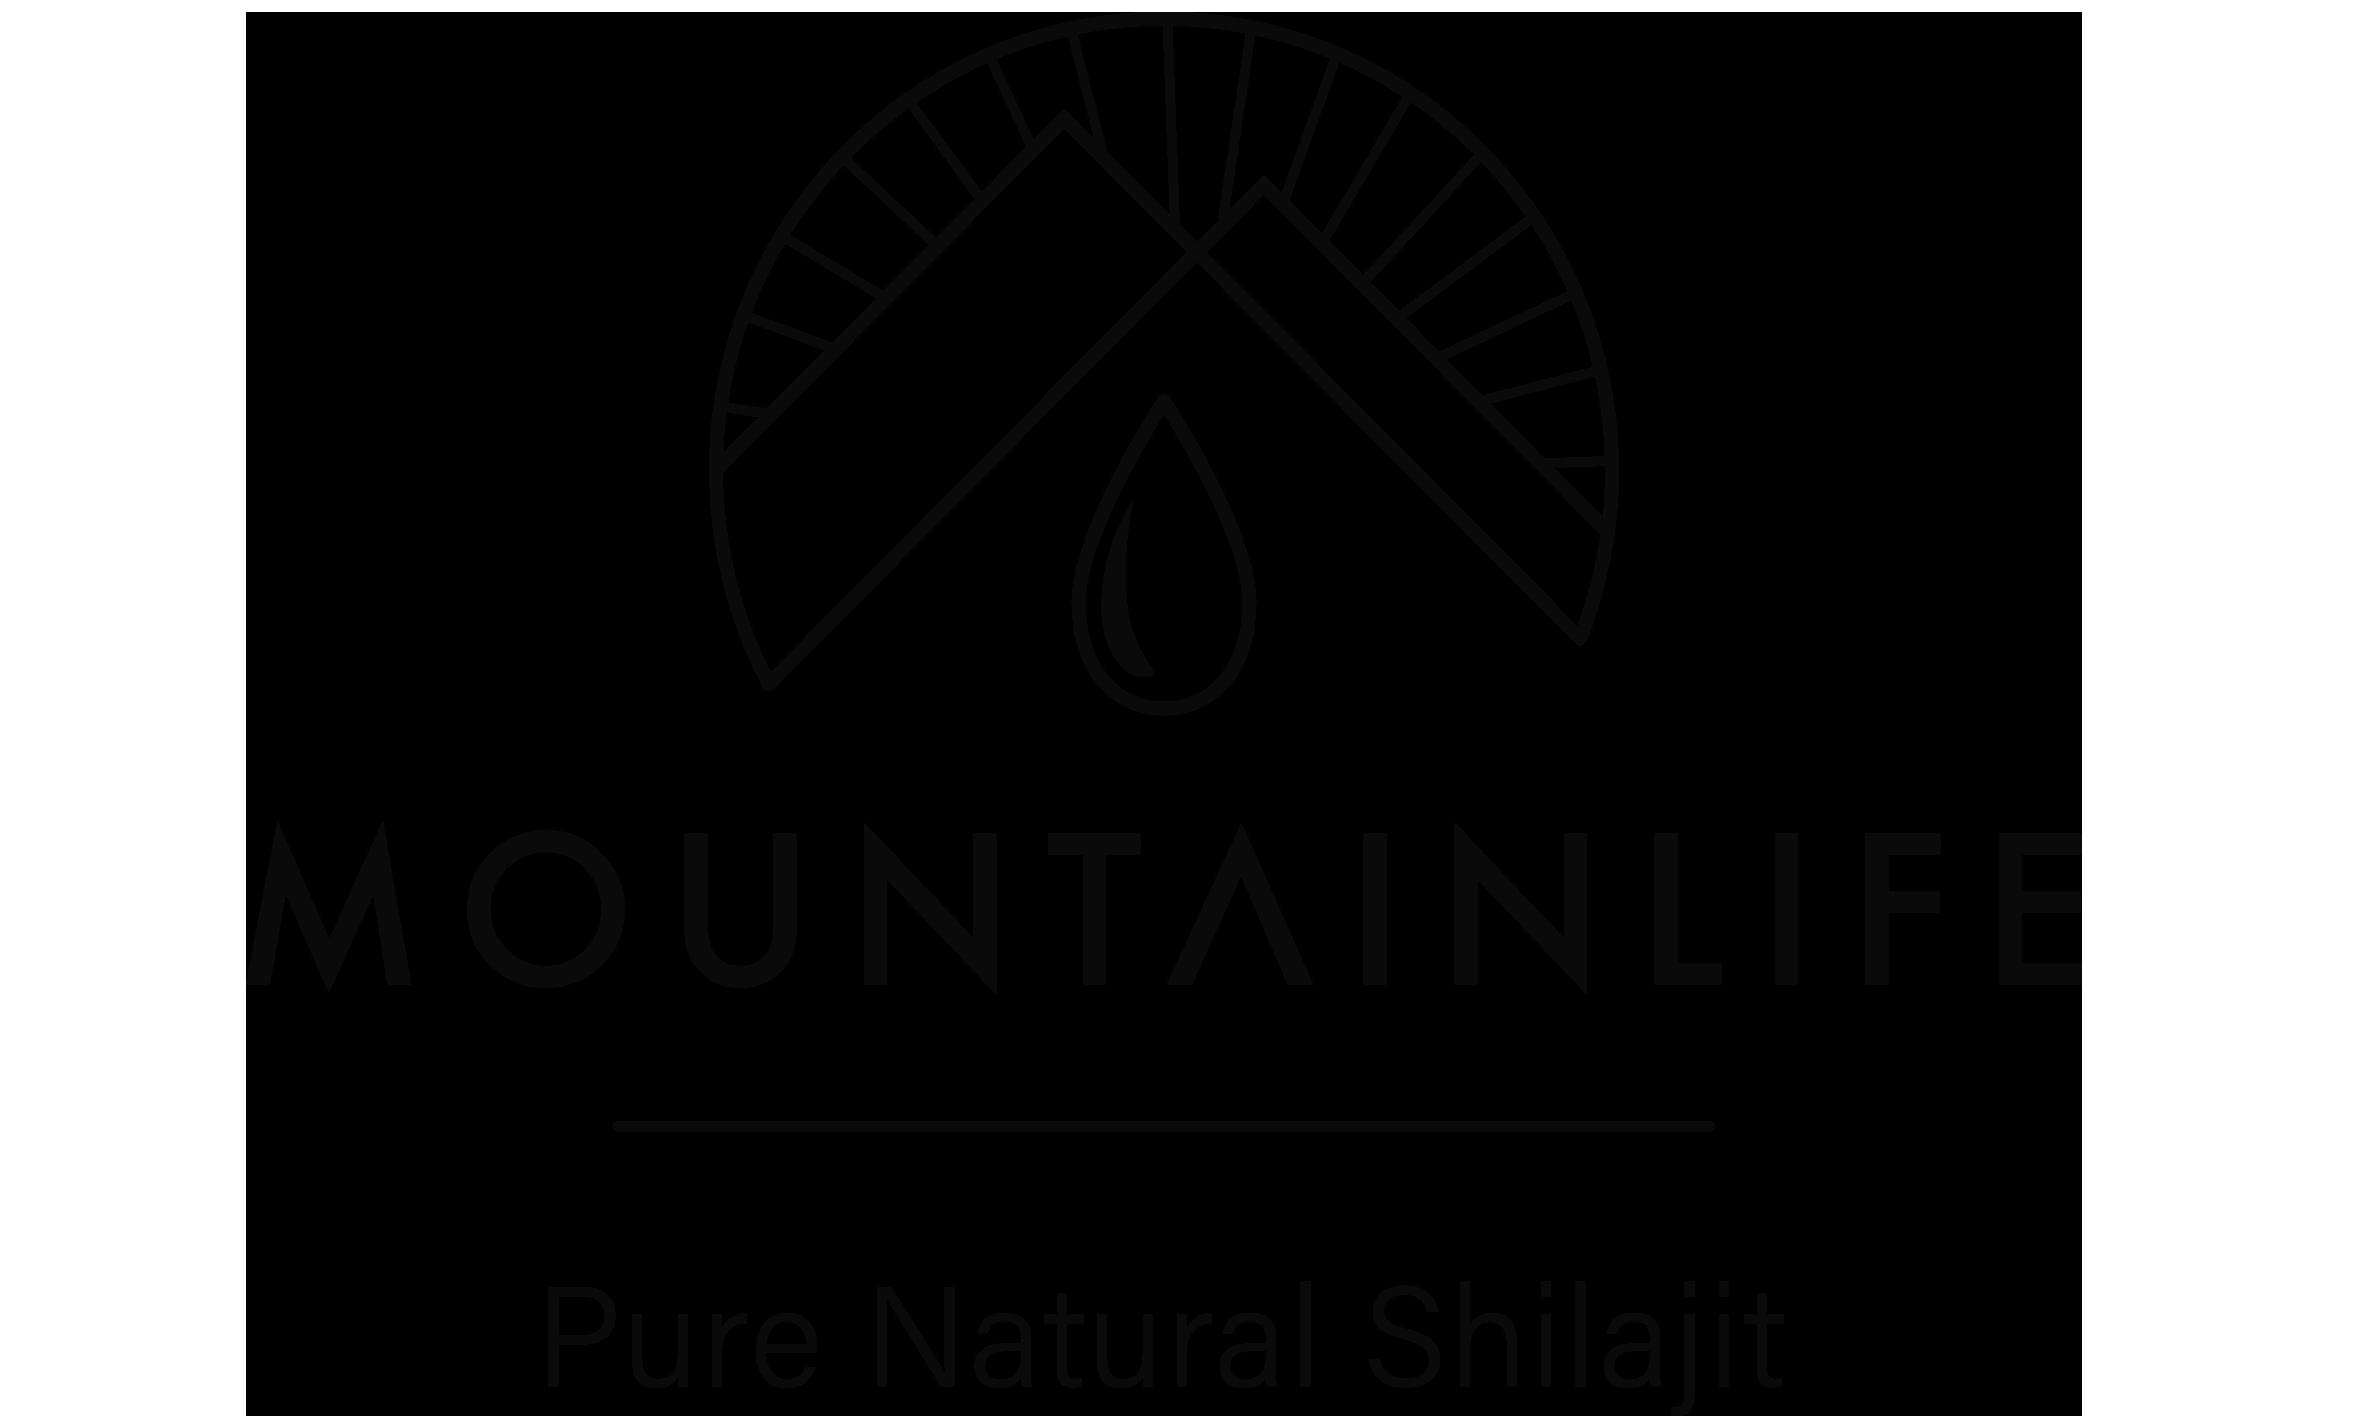 Mountainlife pure natural shilajit logo in black